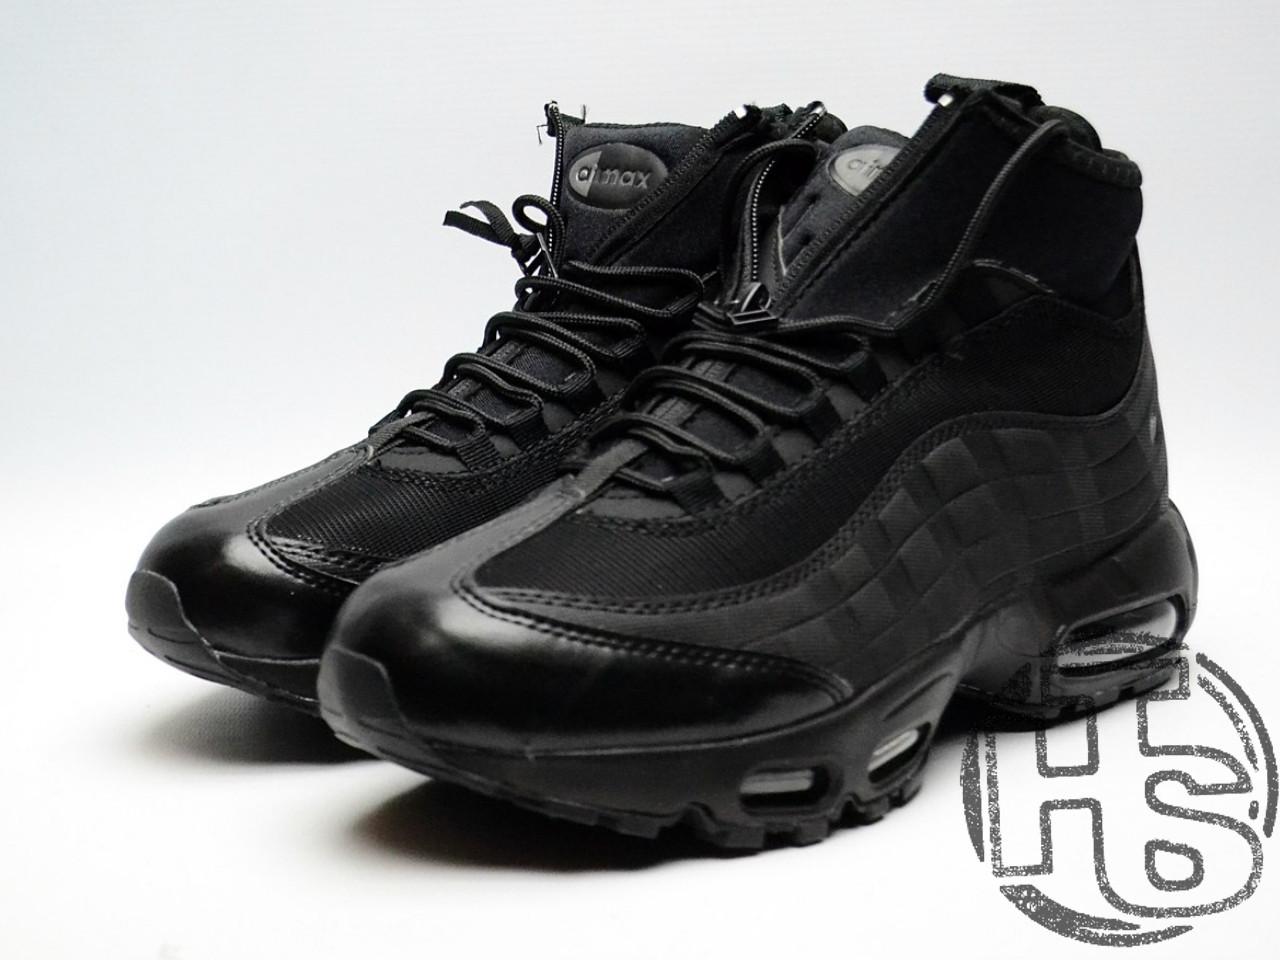 a62db359 Мужские кроссовки Nike Air Max 95 Sneakerboot Triple Black 806809-002, цена  1 379 грн., купить в Львове — Prom.ua (ID#585673453)